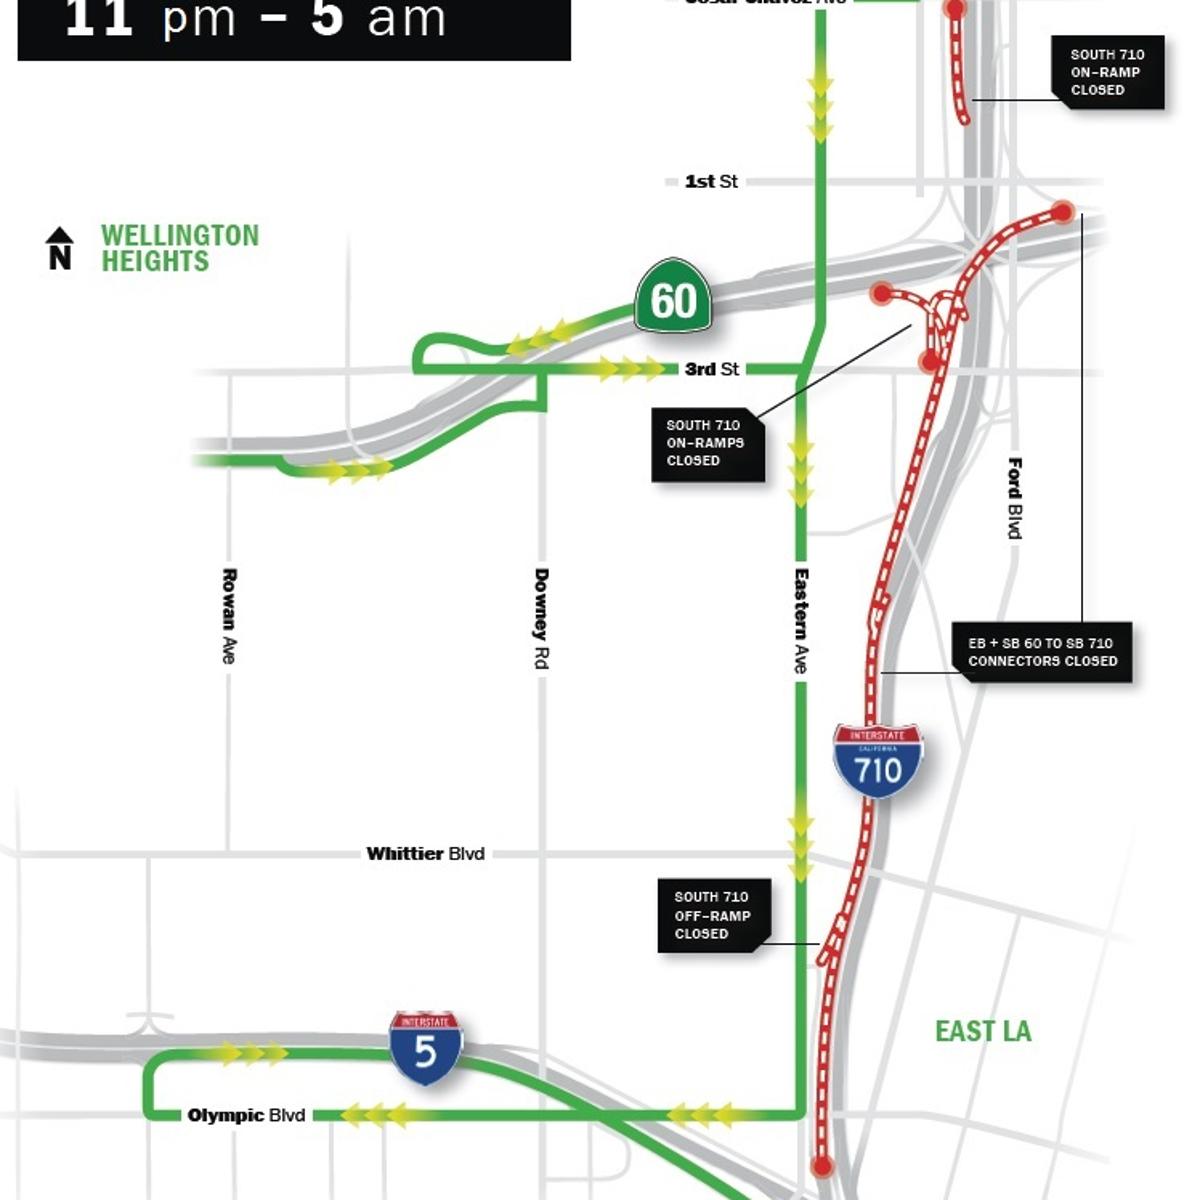 Detour Ahead: Prepare for evening East L A  freeway closures